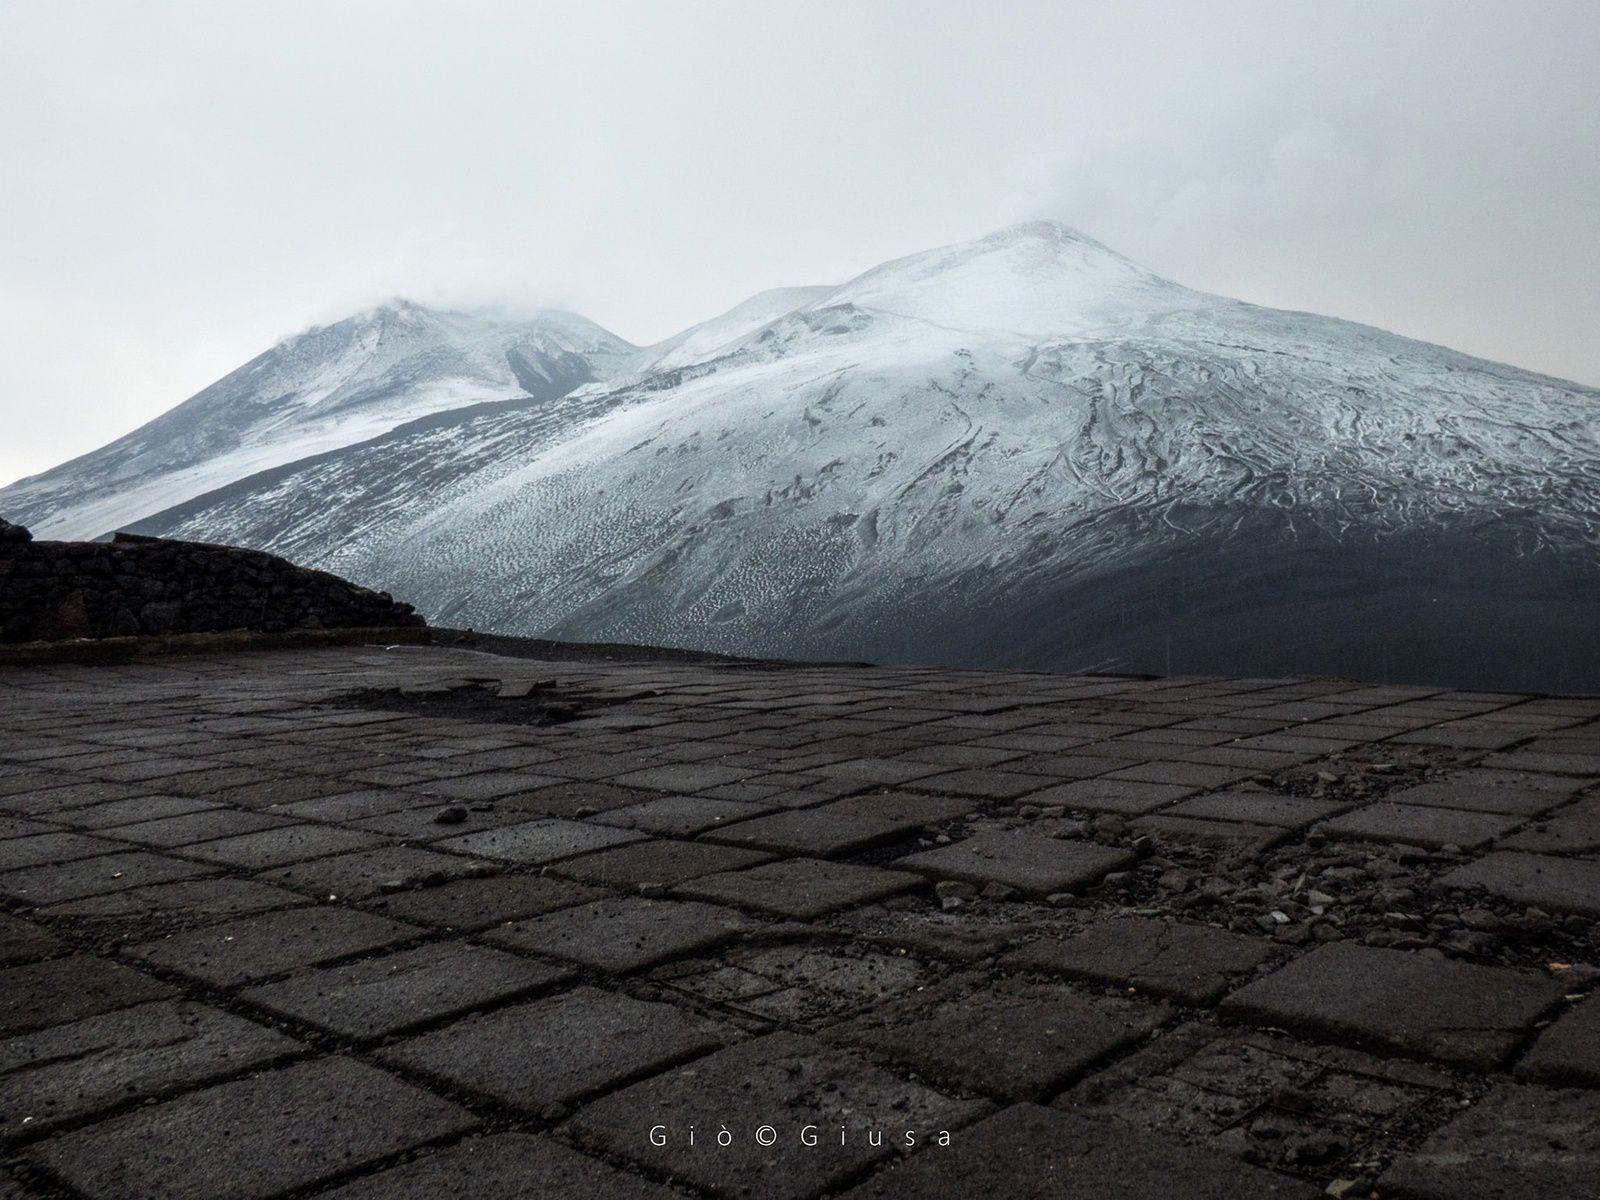 L'Etna en manteau blanc ce 09.08.2018 - photo Gio Giusa depuis Pizzi Deneri Etna Nord 2850 m.